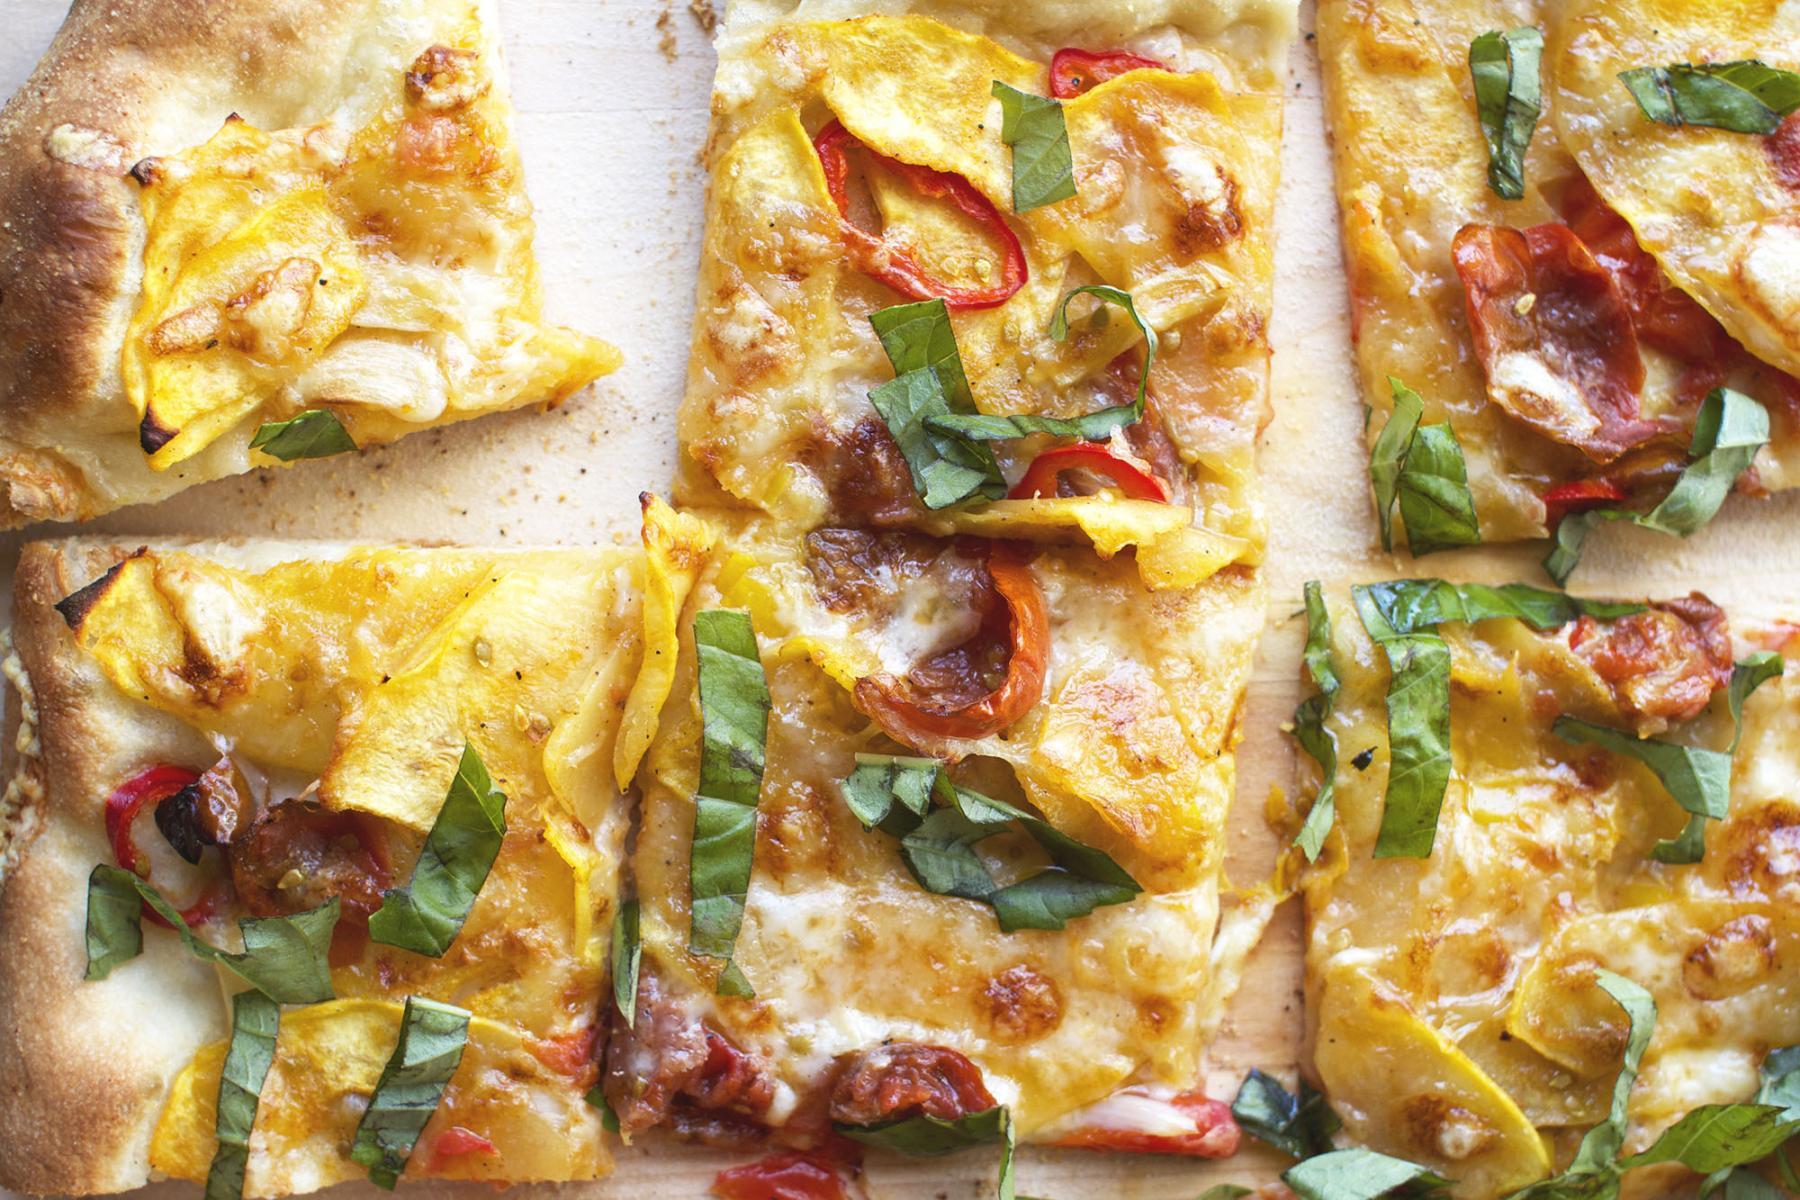 00-squash-pizza.jpg